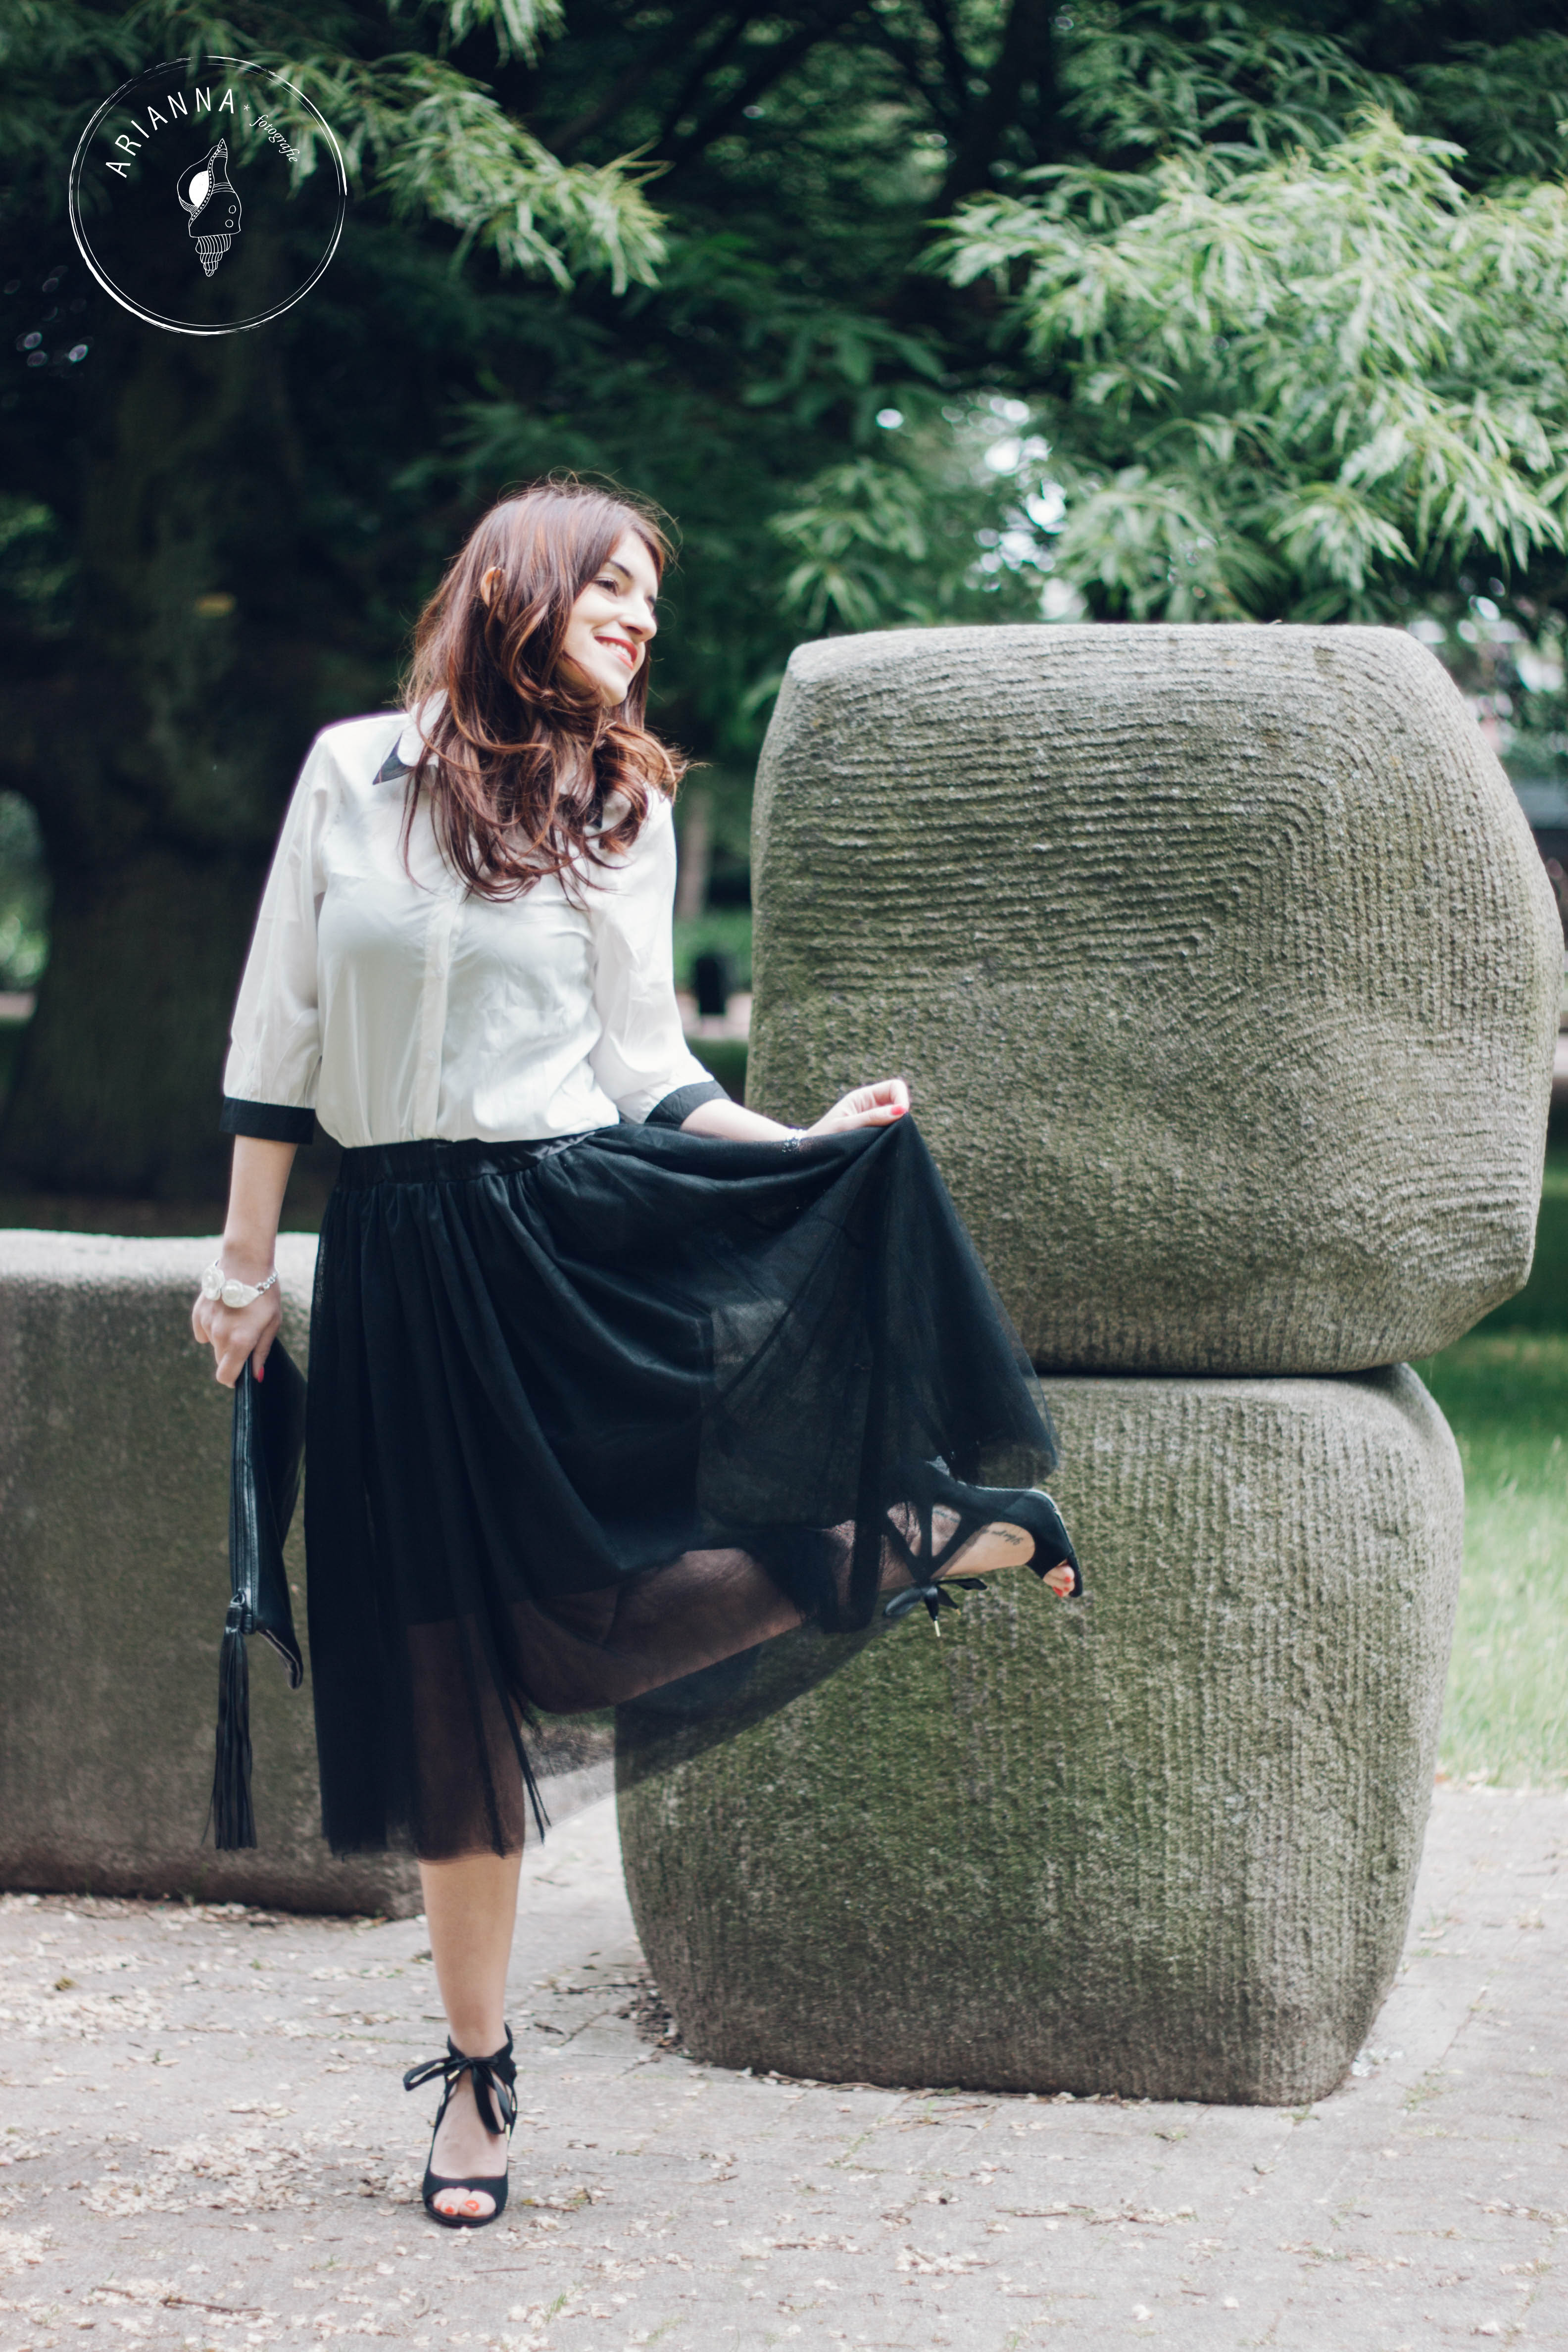 Camicia_biancanera-7 copy